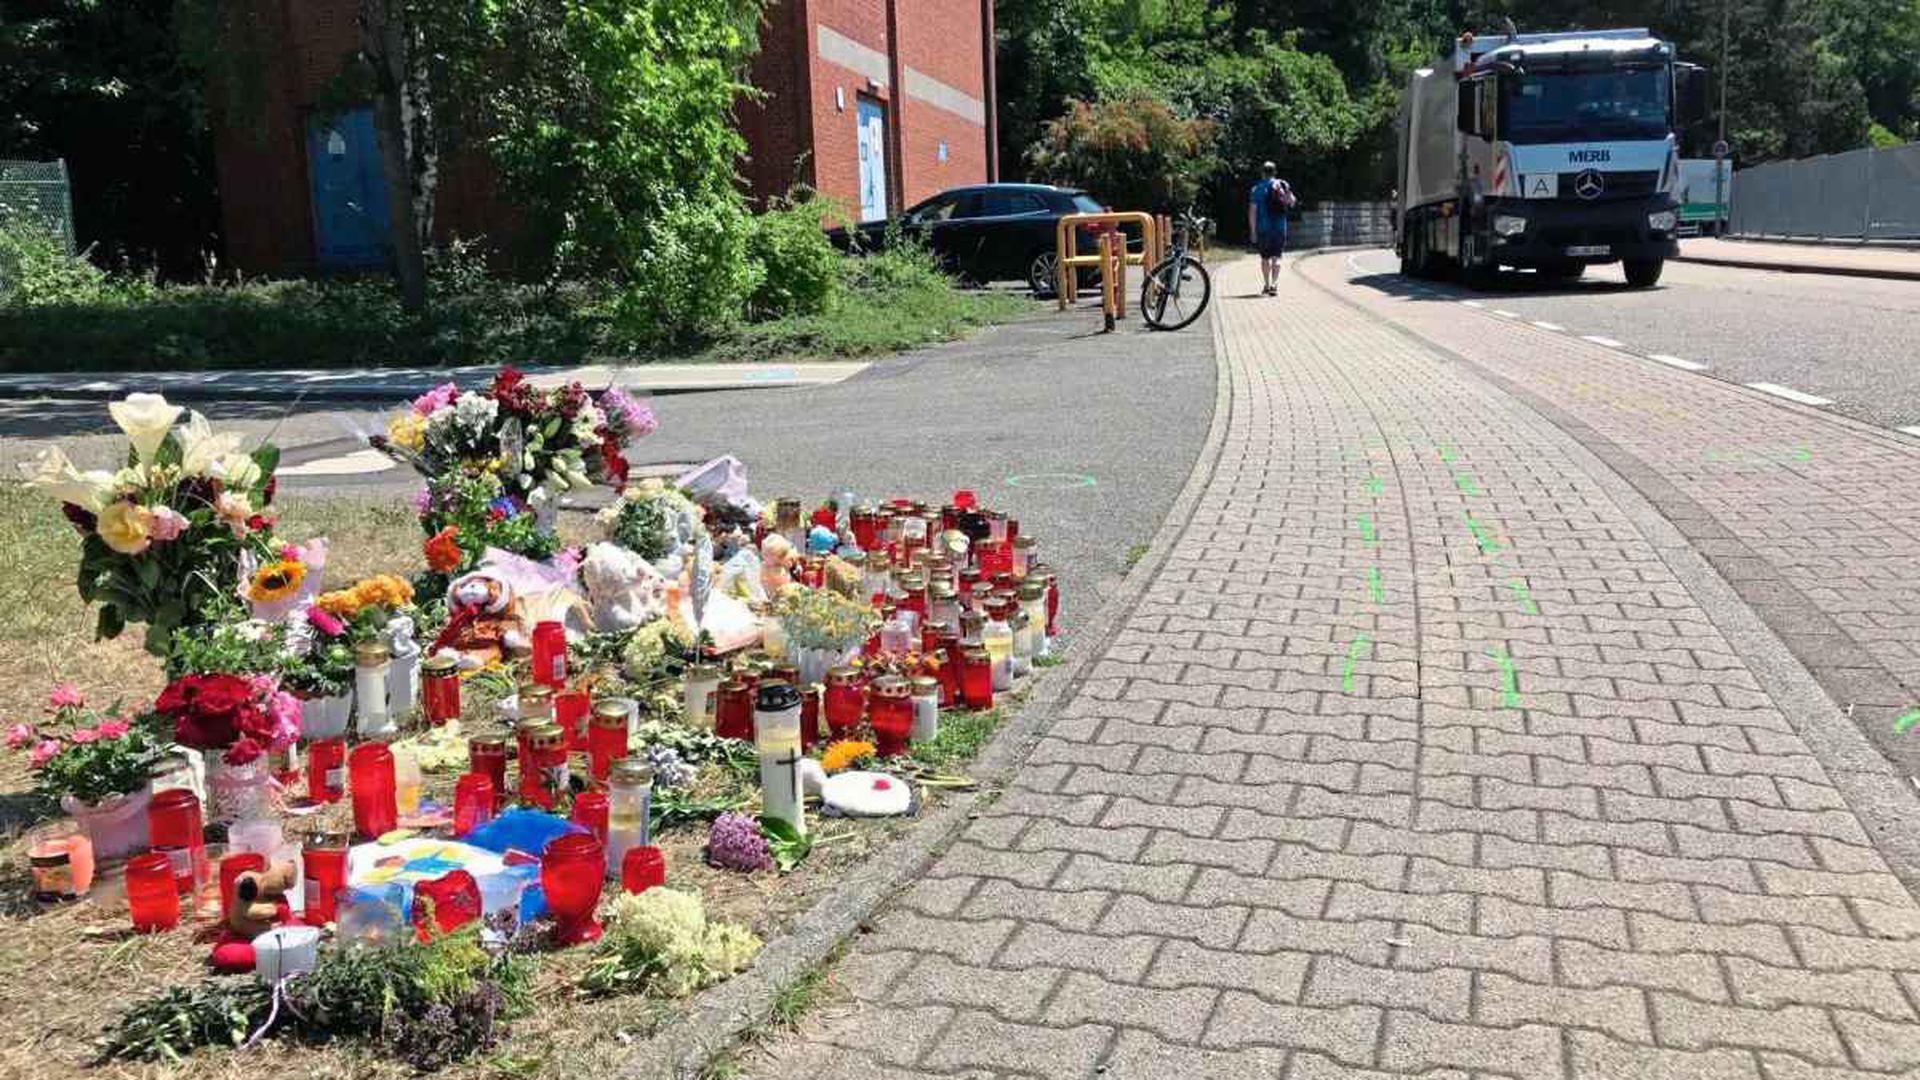 Kerzen stehen am Unfallort in Gaggenau